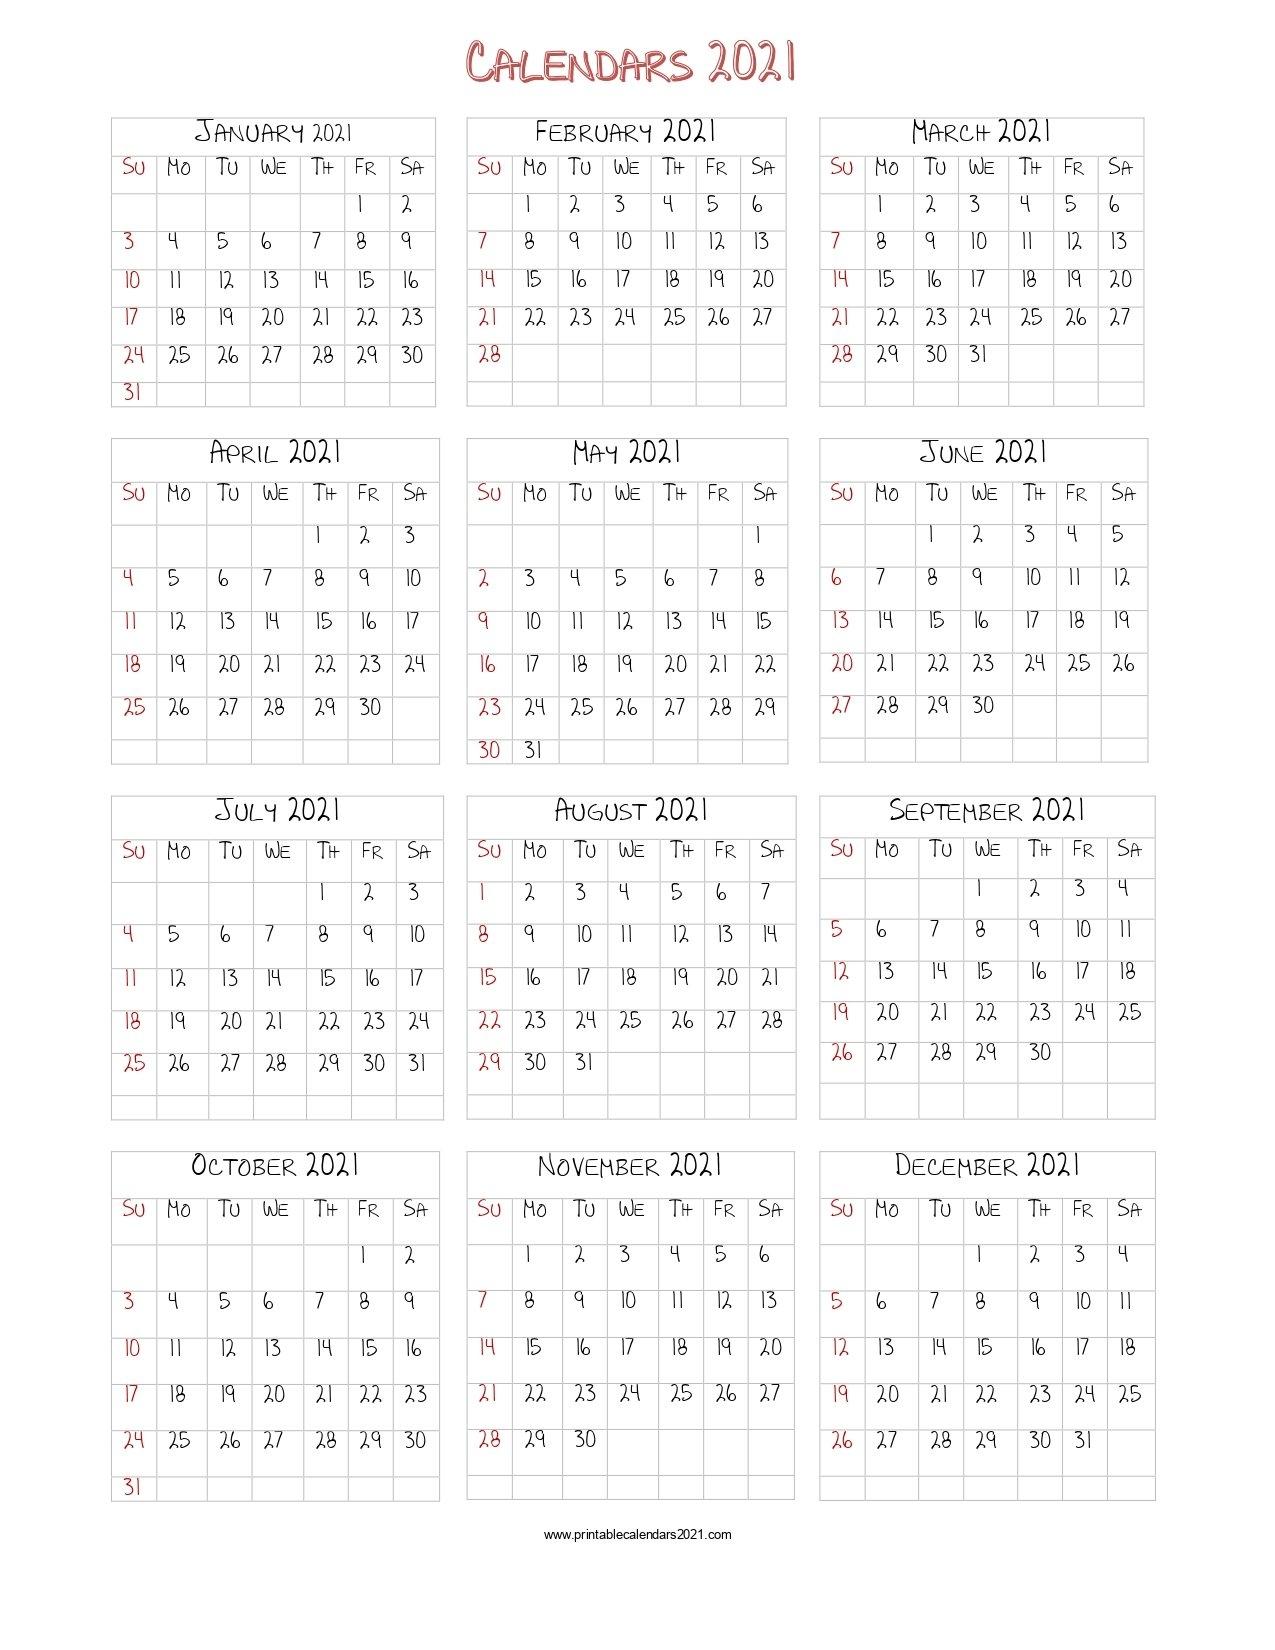 56+ Printable Calendar 2021 One Page, Printable 2021 Yearly Calendar inside Free Printable 2021 Calendar Portrait